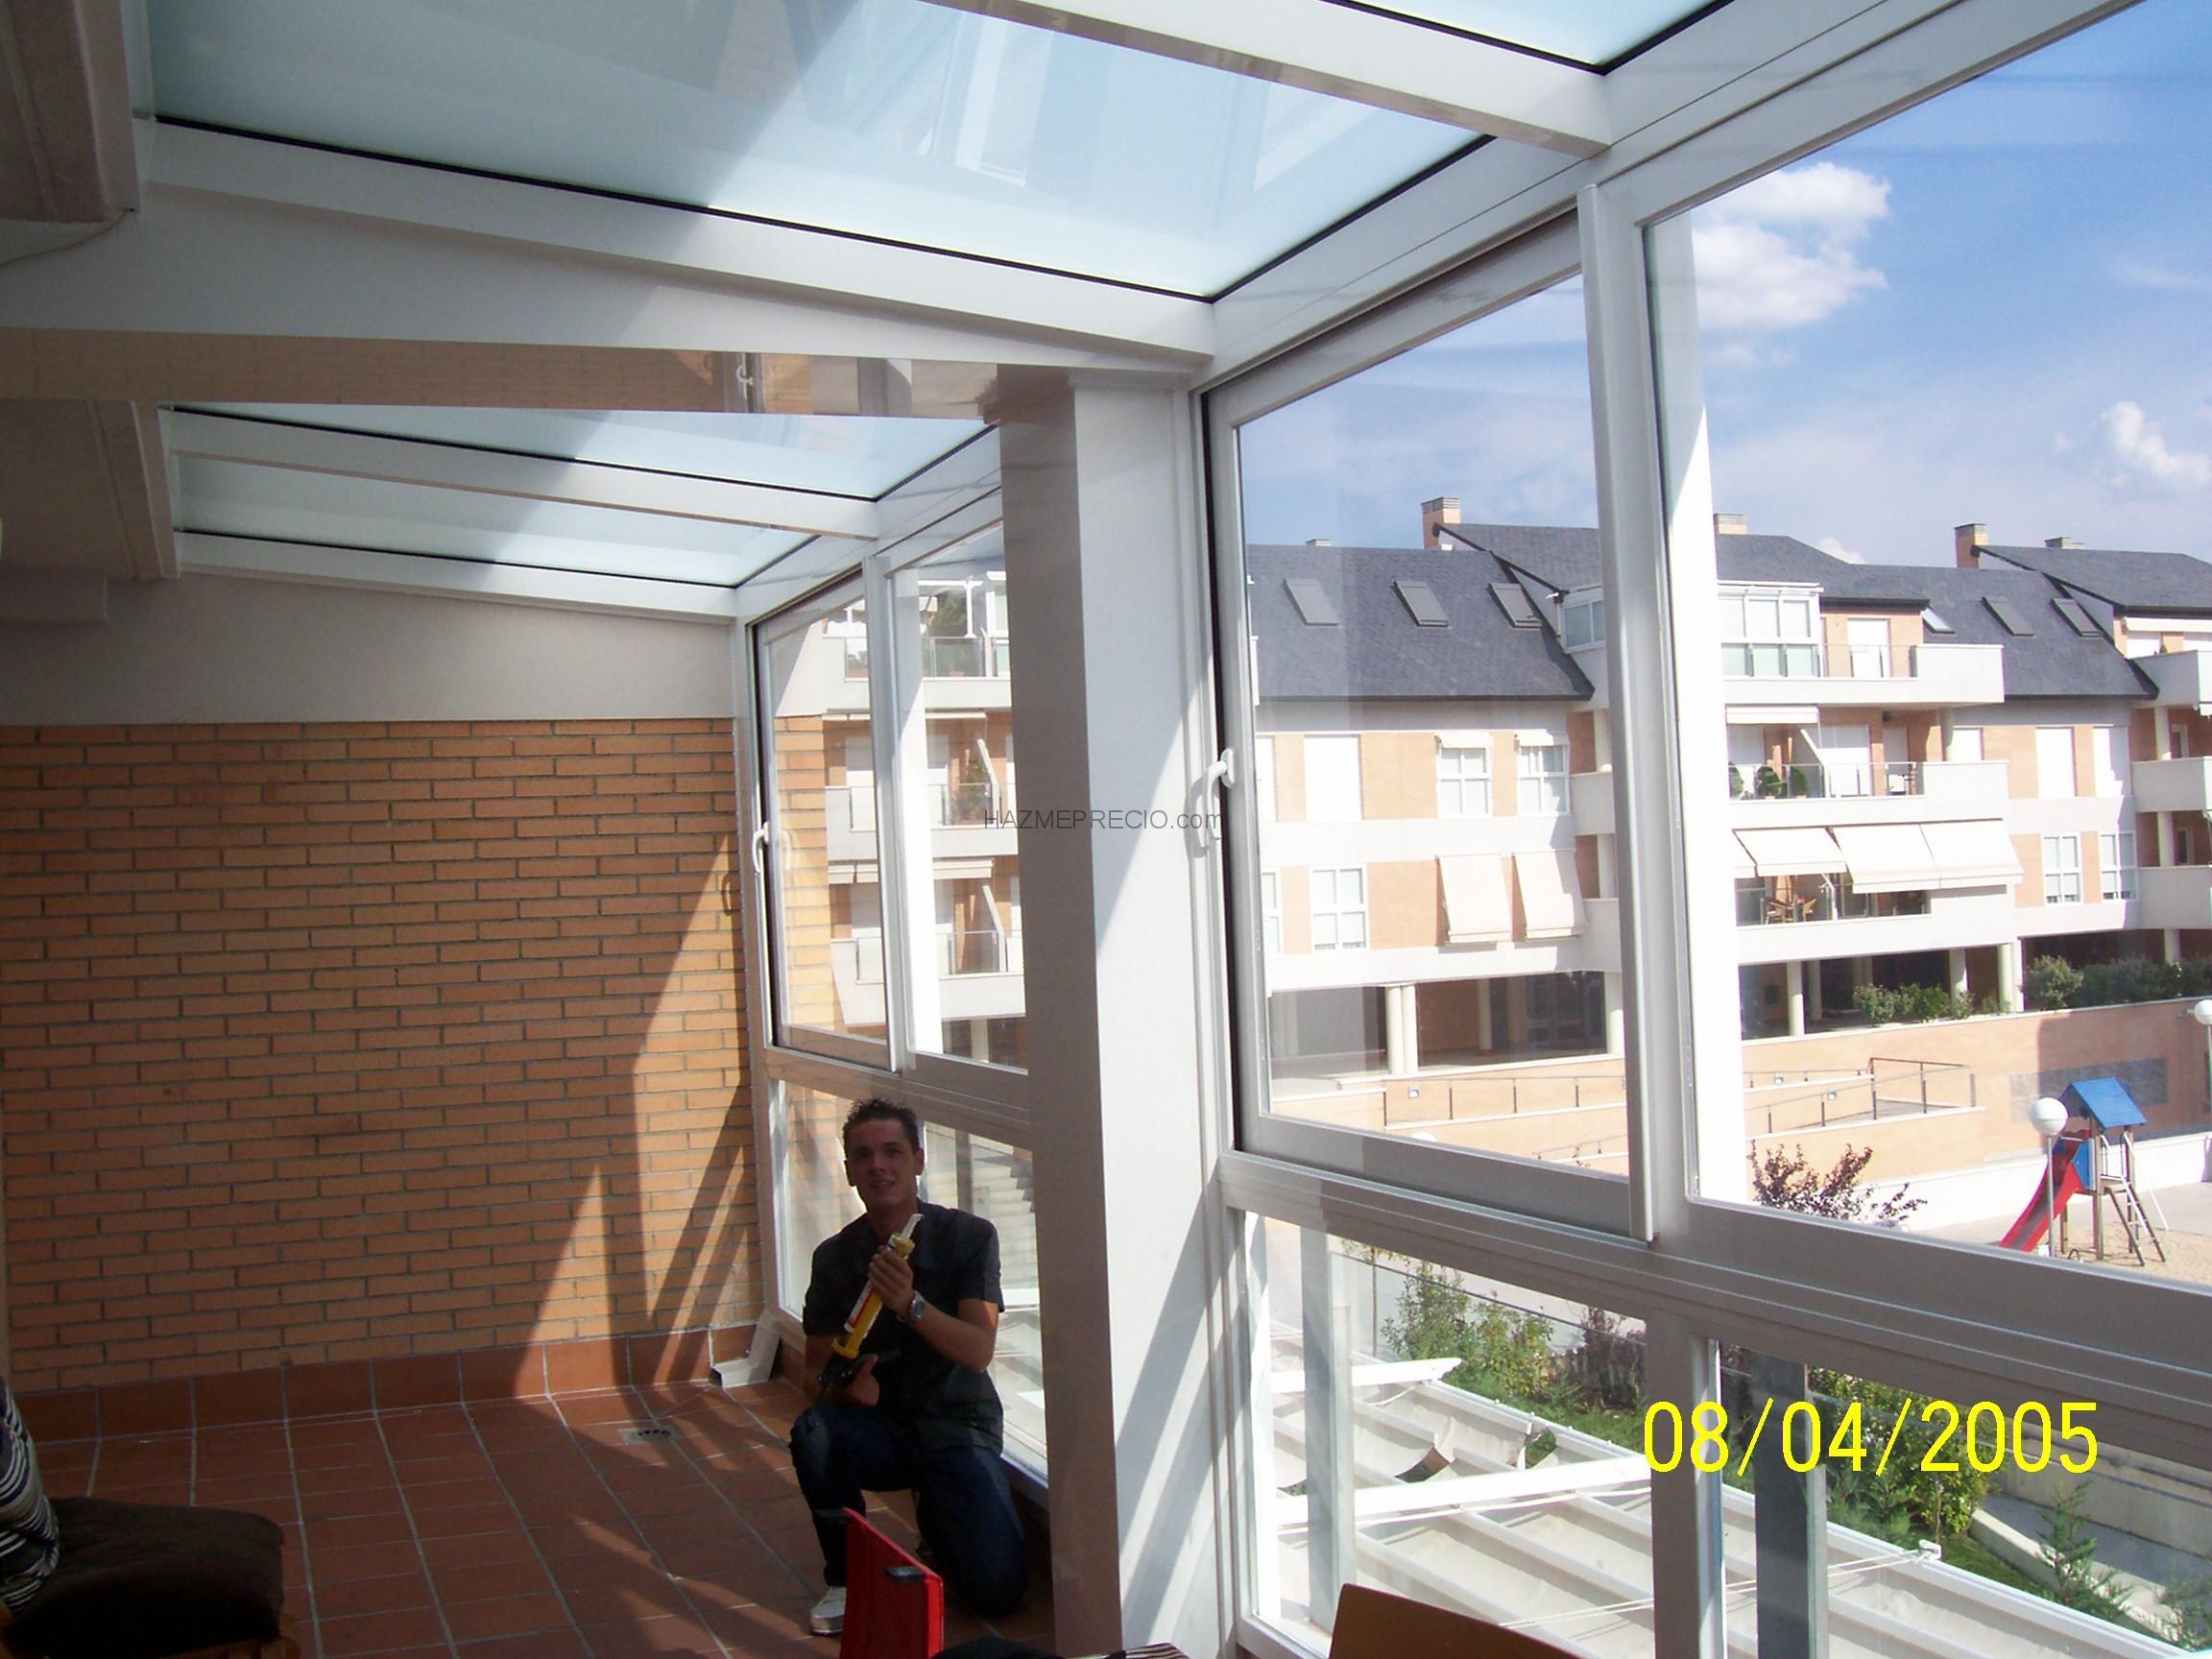 Cerrar terraza atico cheap cerramiento de pvc en una - Cerrar terraza aluminio ...